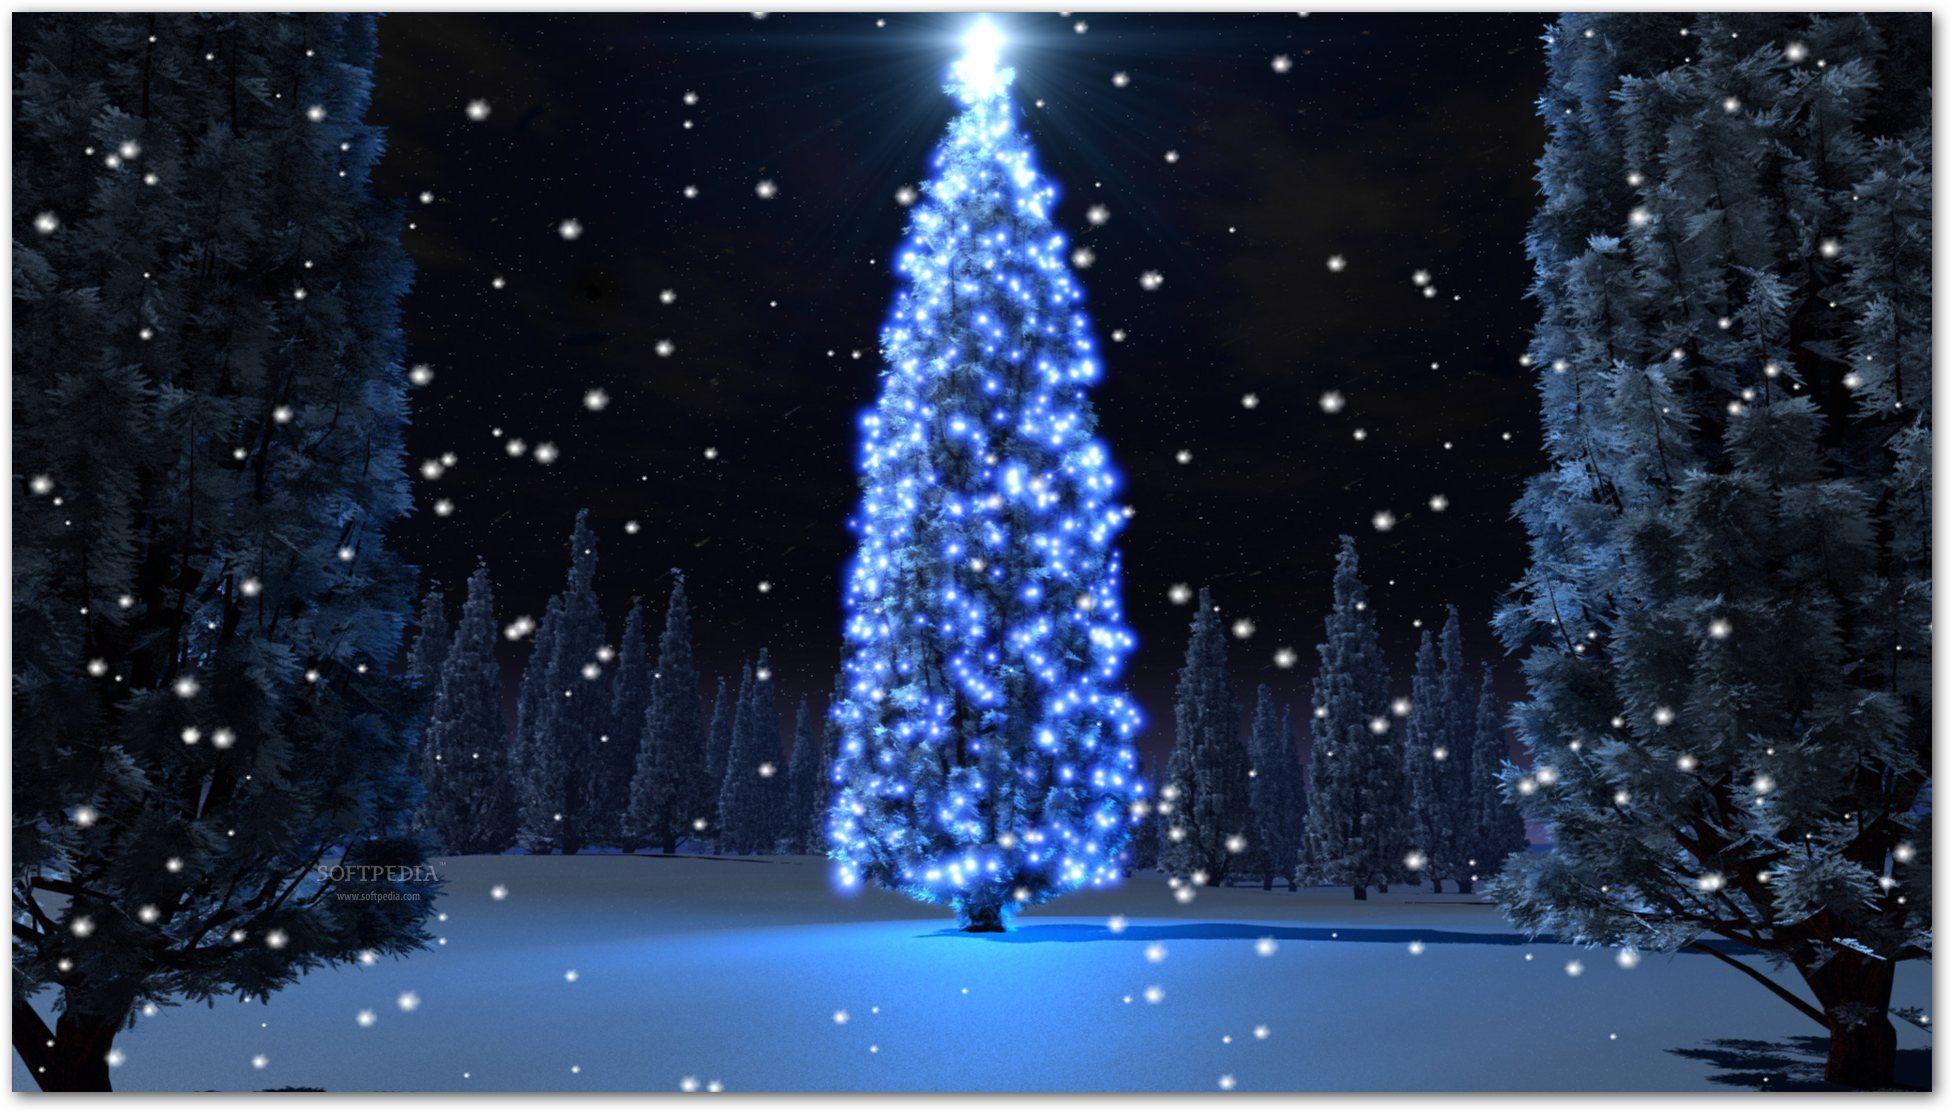 Christmas Countdown Desktop Wallpaper Quoteko Com Holiday Tree Christmas Lights Christmas Countdown